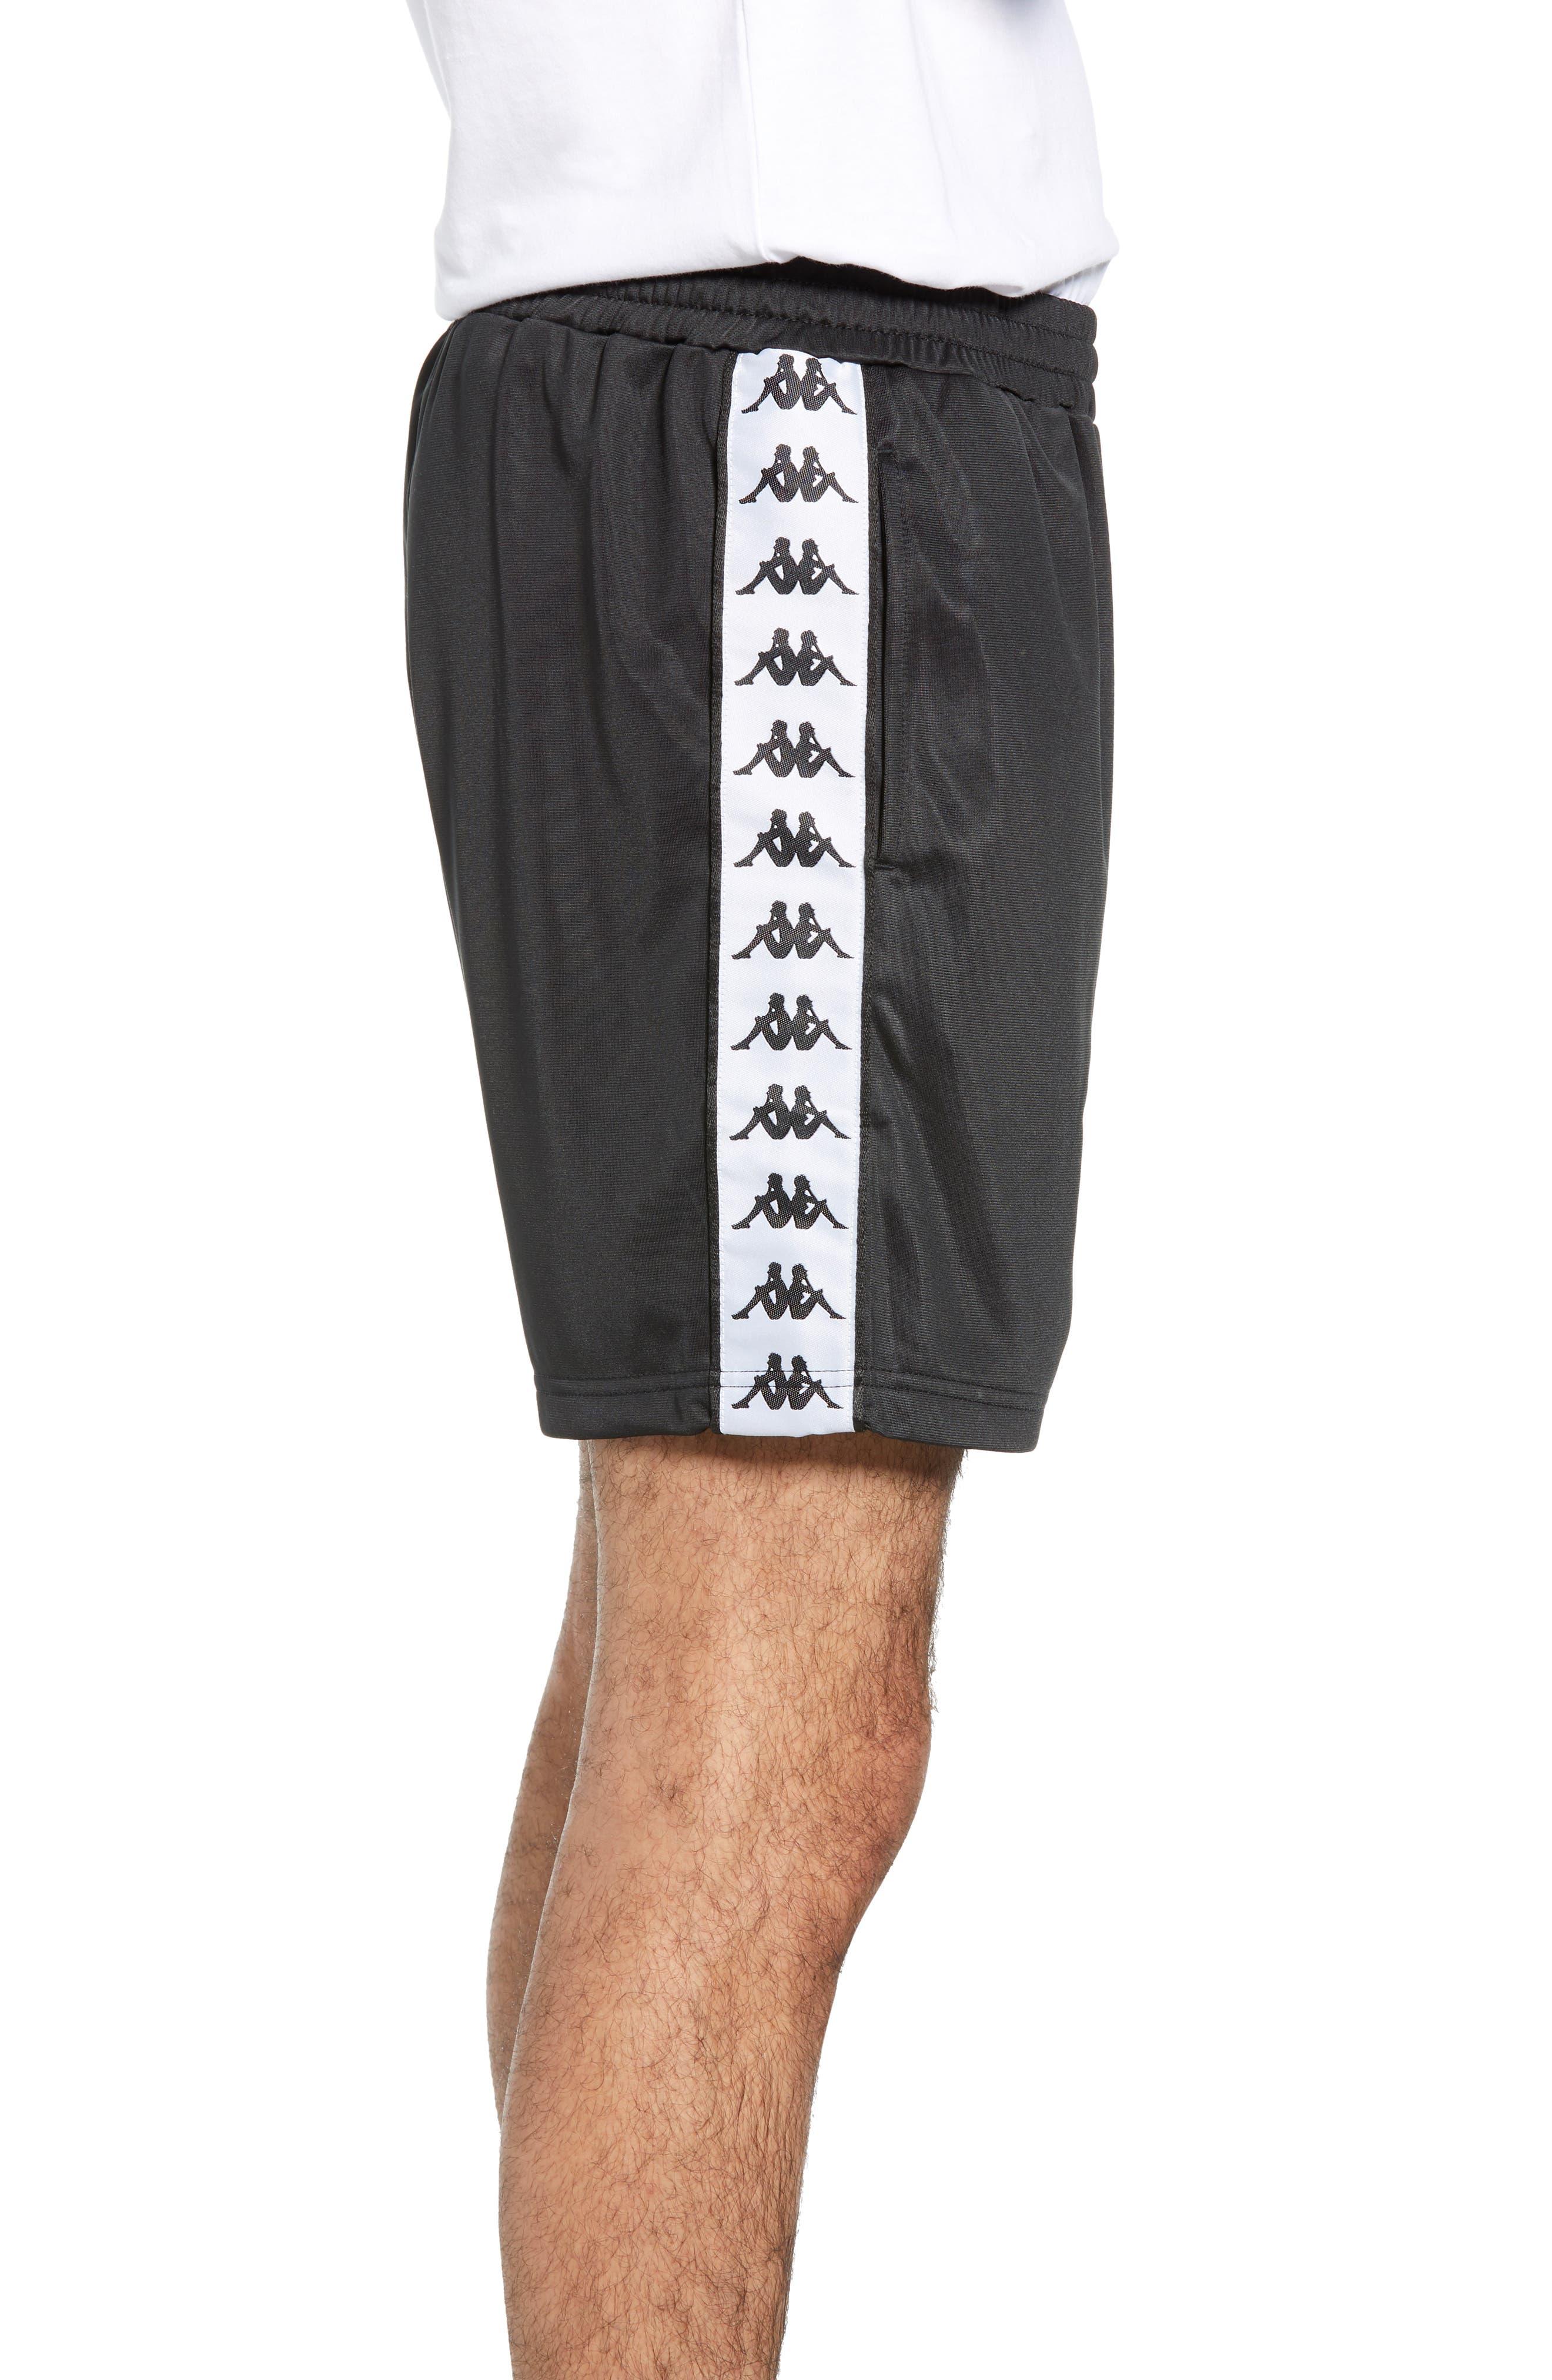 KAPPA, 222 Banda Cole Athletic Shorts, Alternate thumbnail 4, color, BLACK/ WHITE